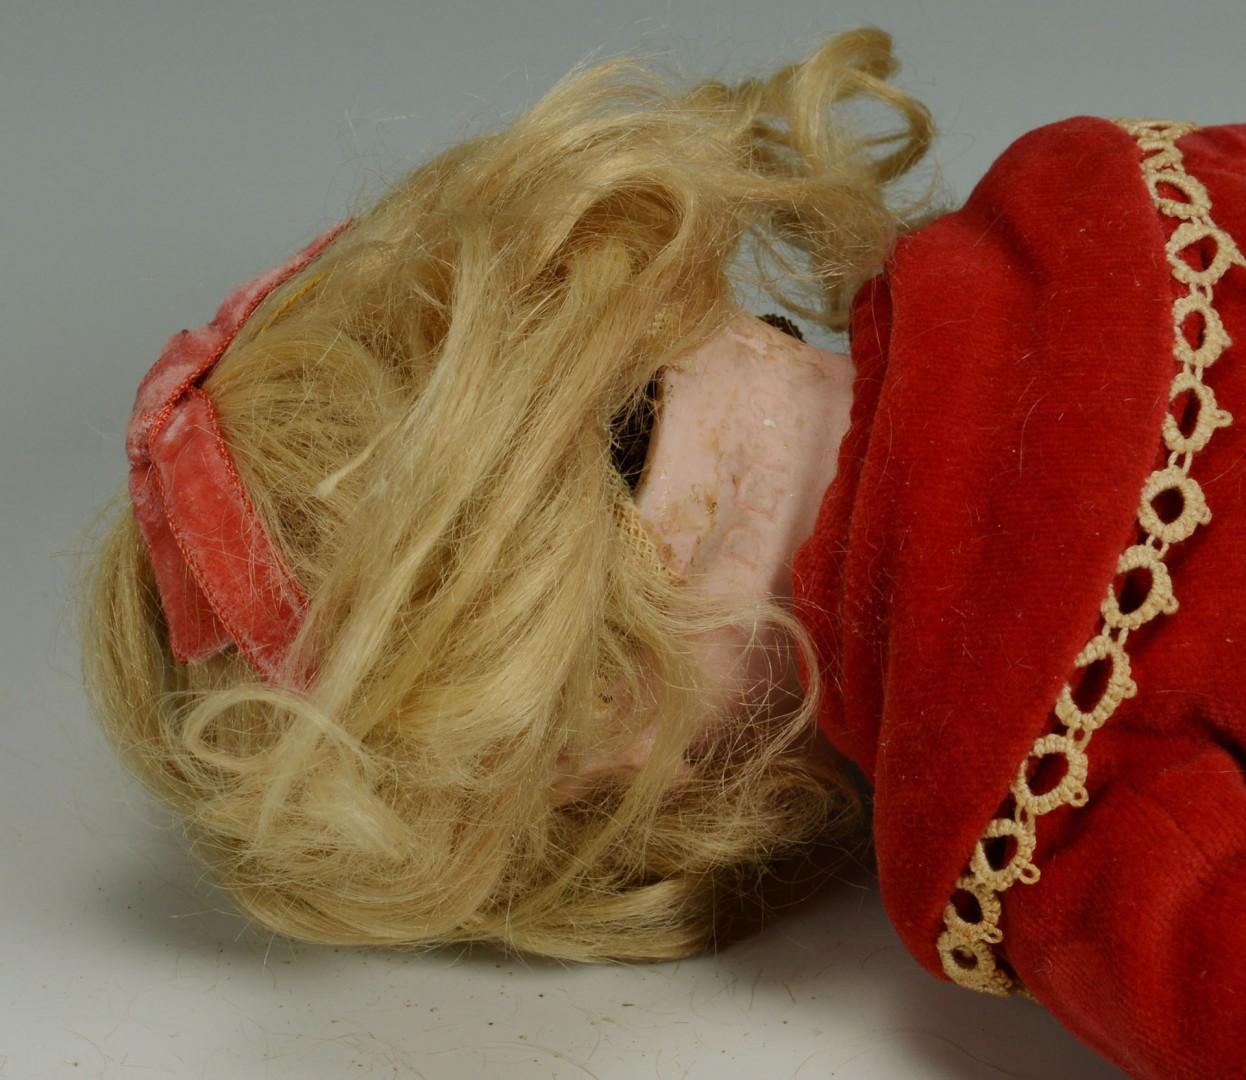 Lot 674: Depose Jumeau Bebe Doll in Petite Size